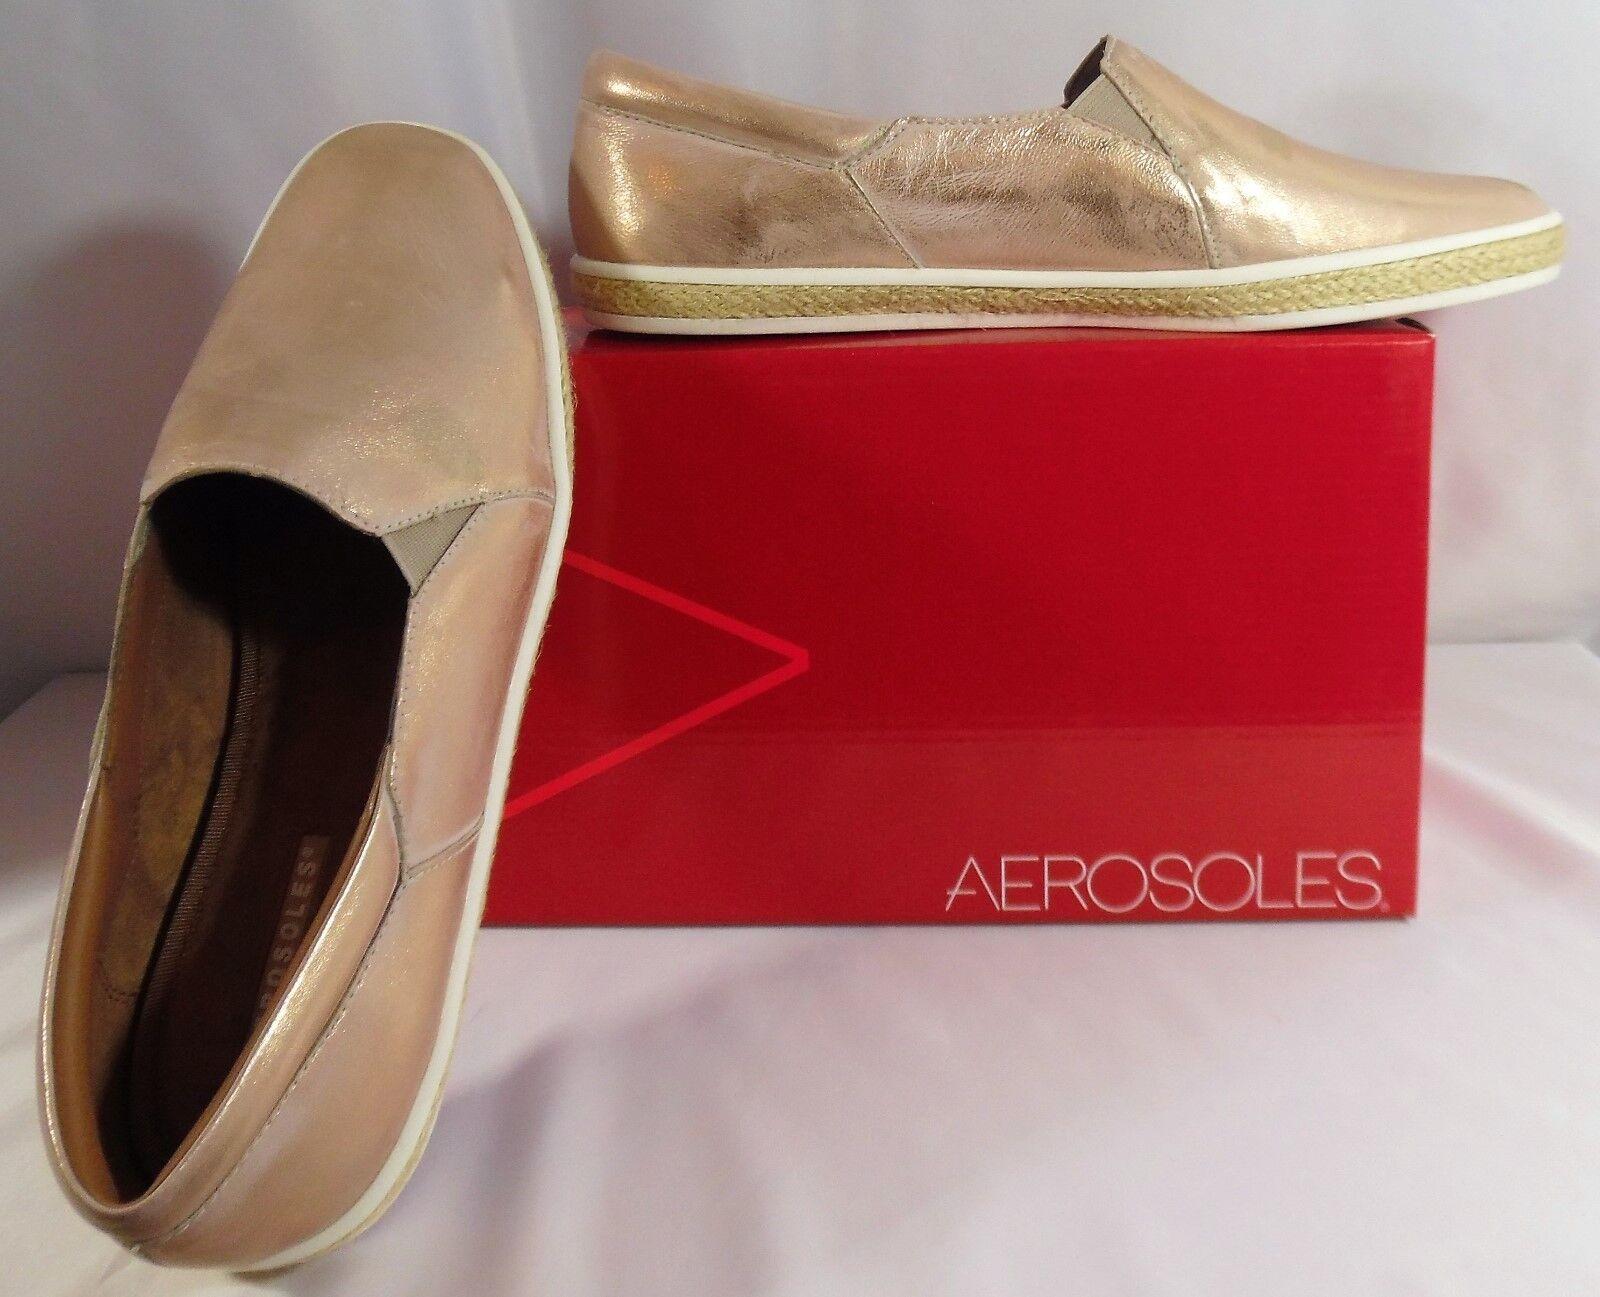 Aerosoles Women's Fun Fact Fashion Sneakers 9-1 2 M Bronze Leather Flats 9.5 B